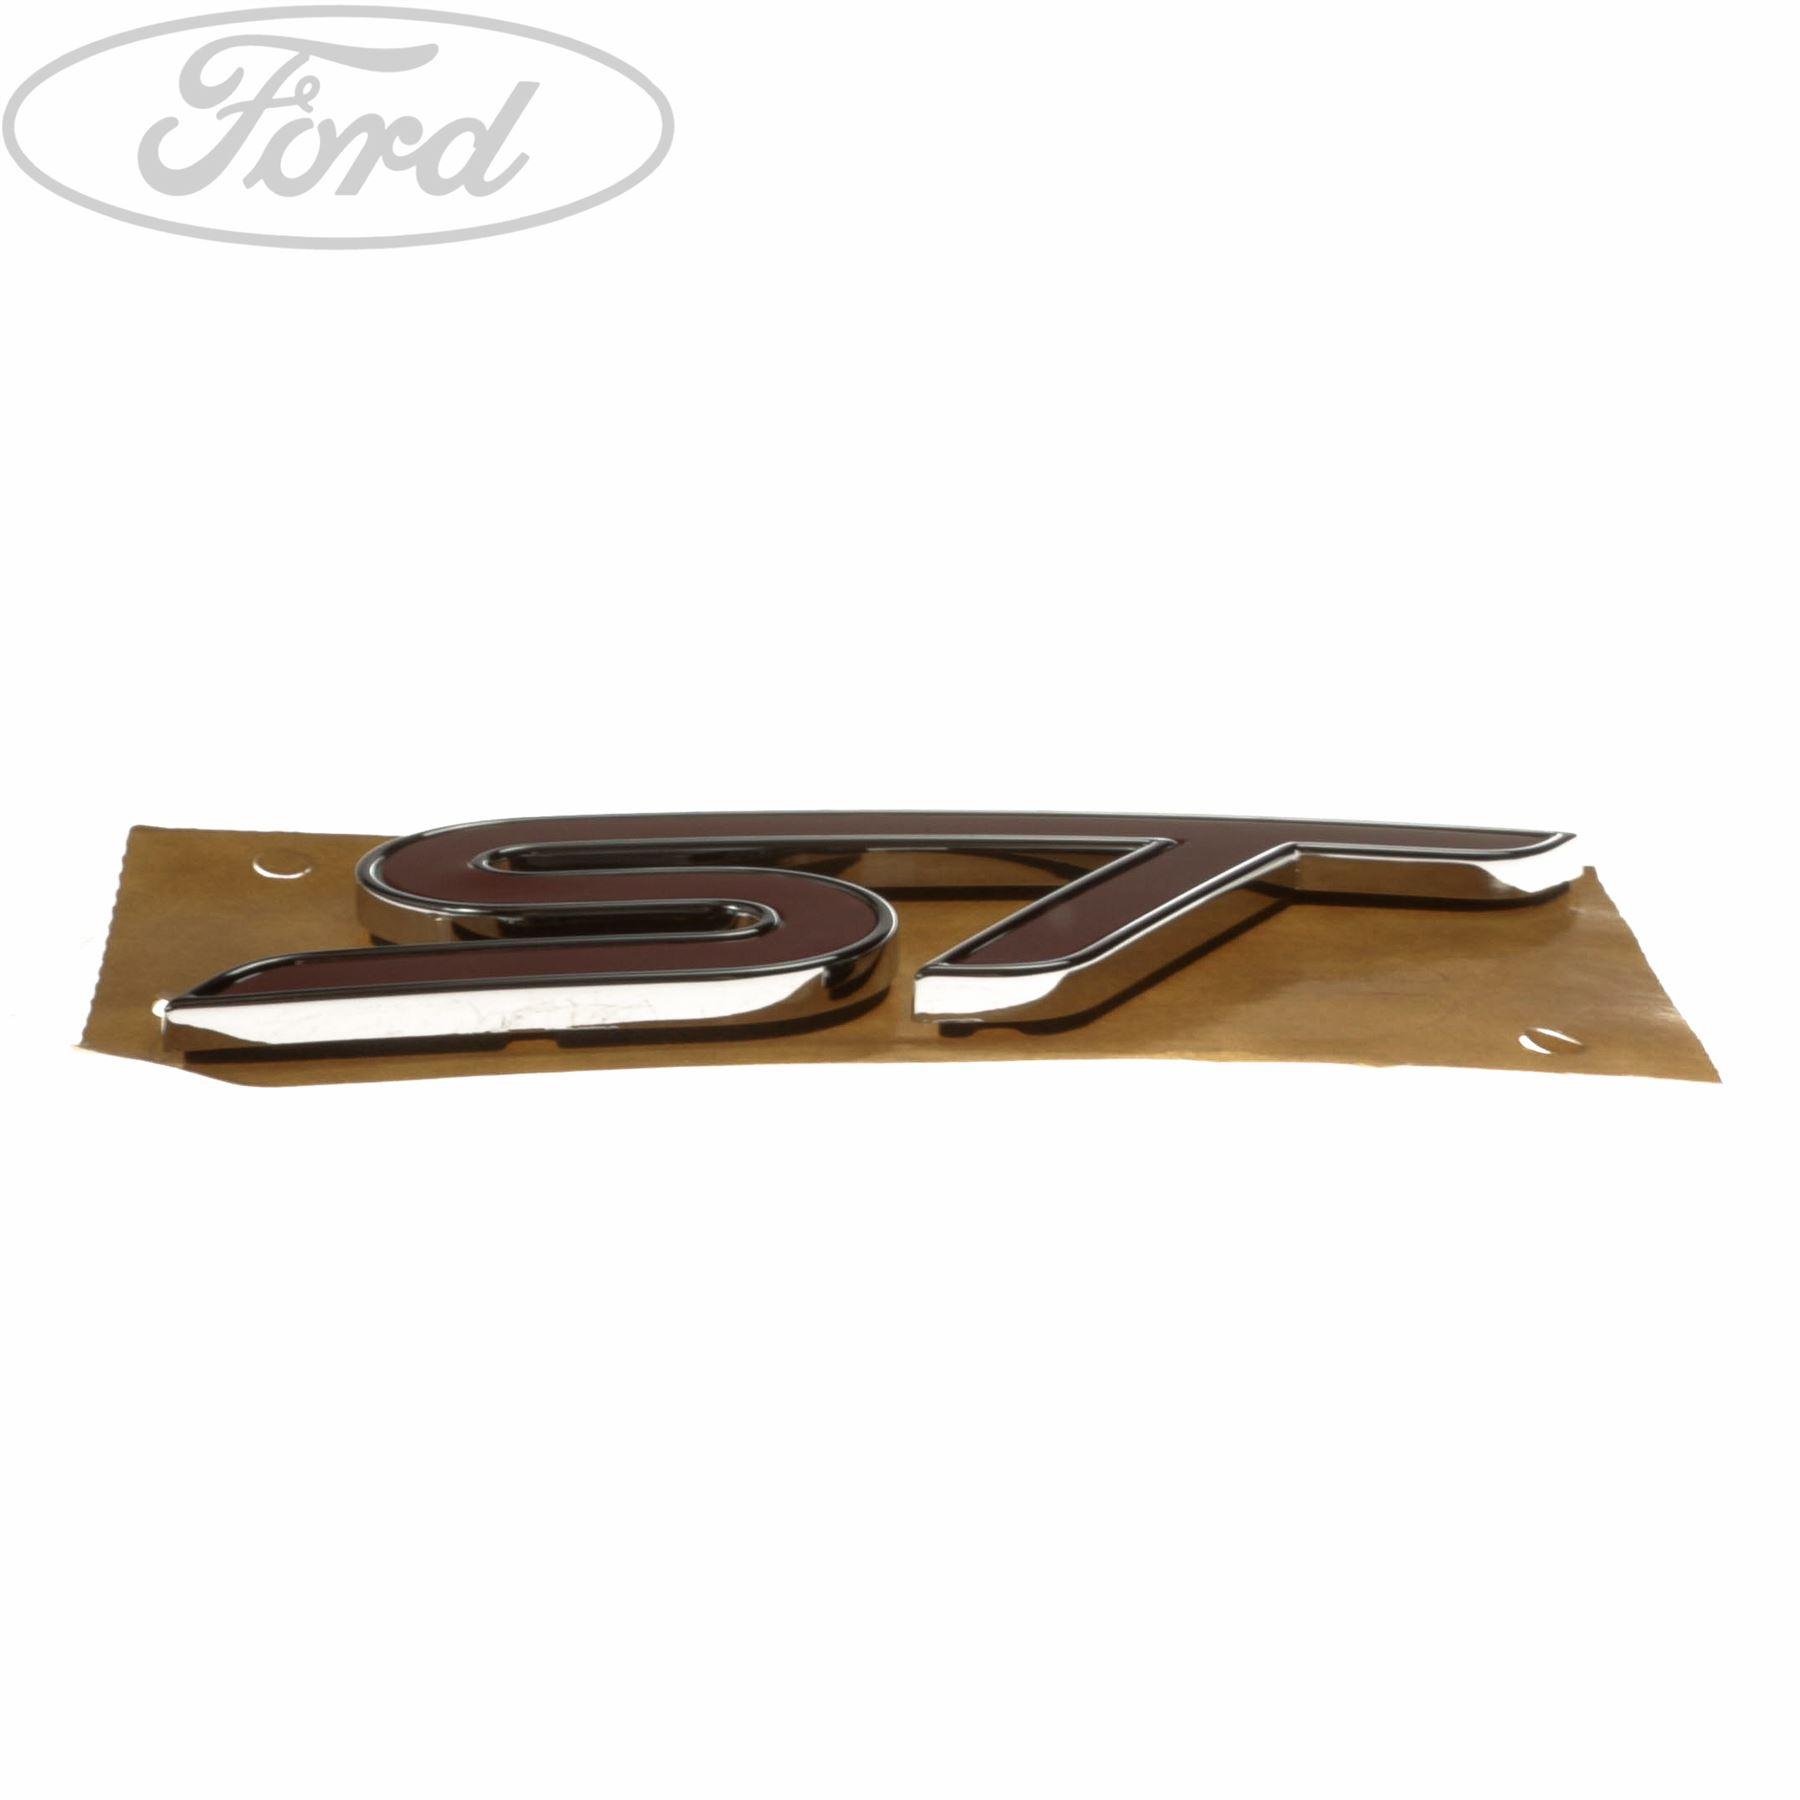 Genuine Ford Fiesta Mk7 St Tailgate Name Plate Badge